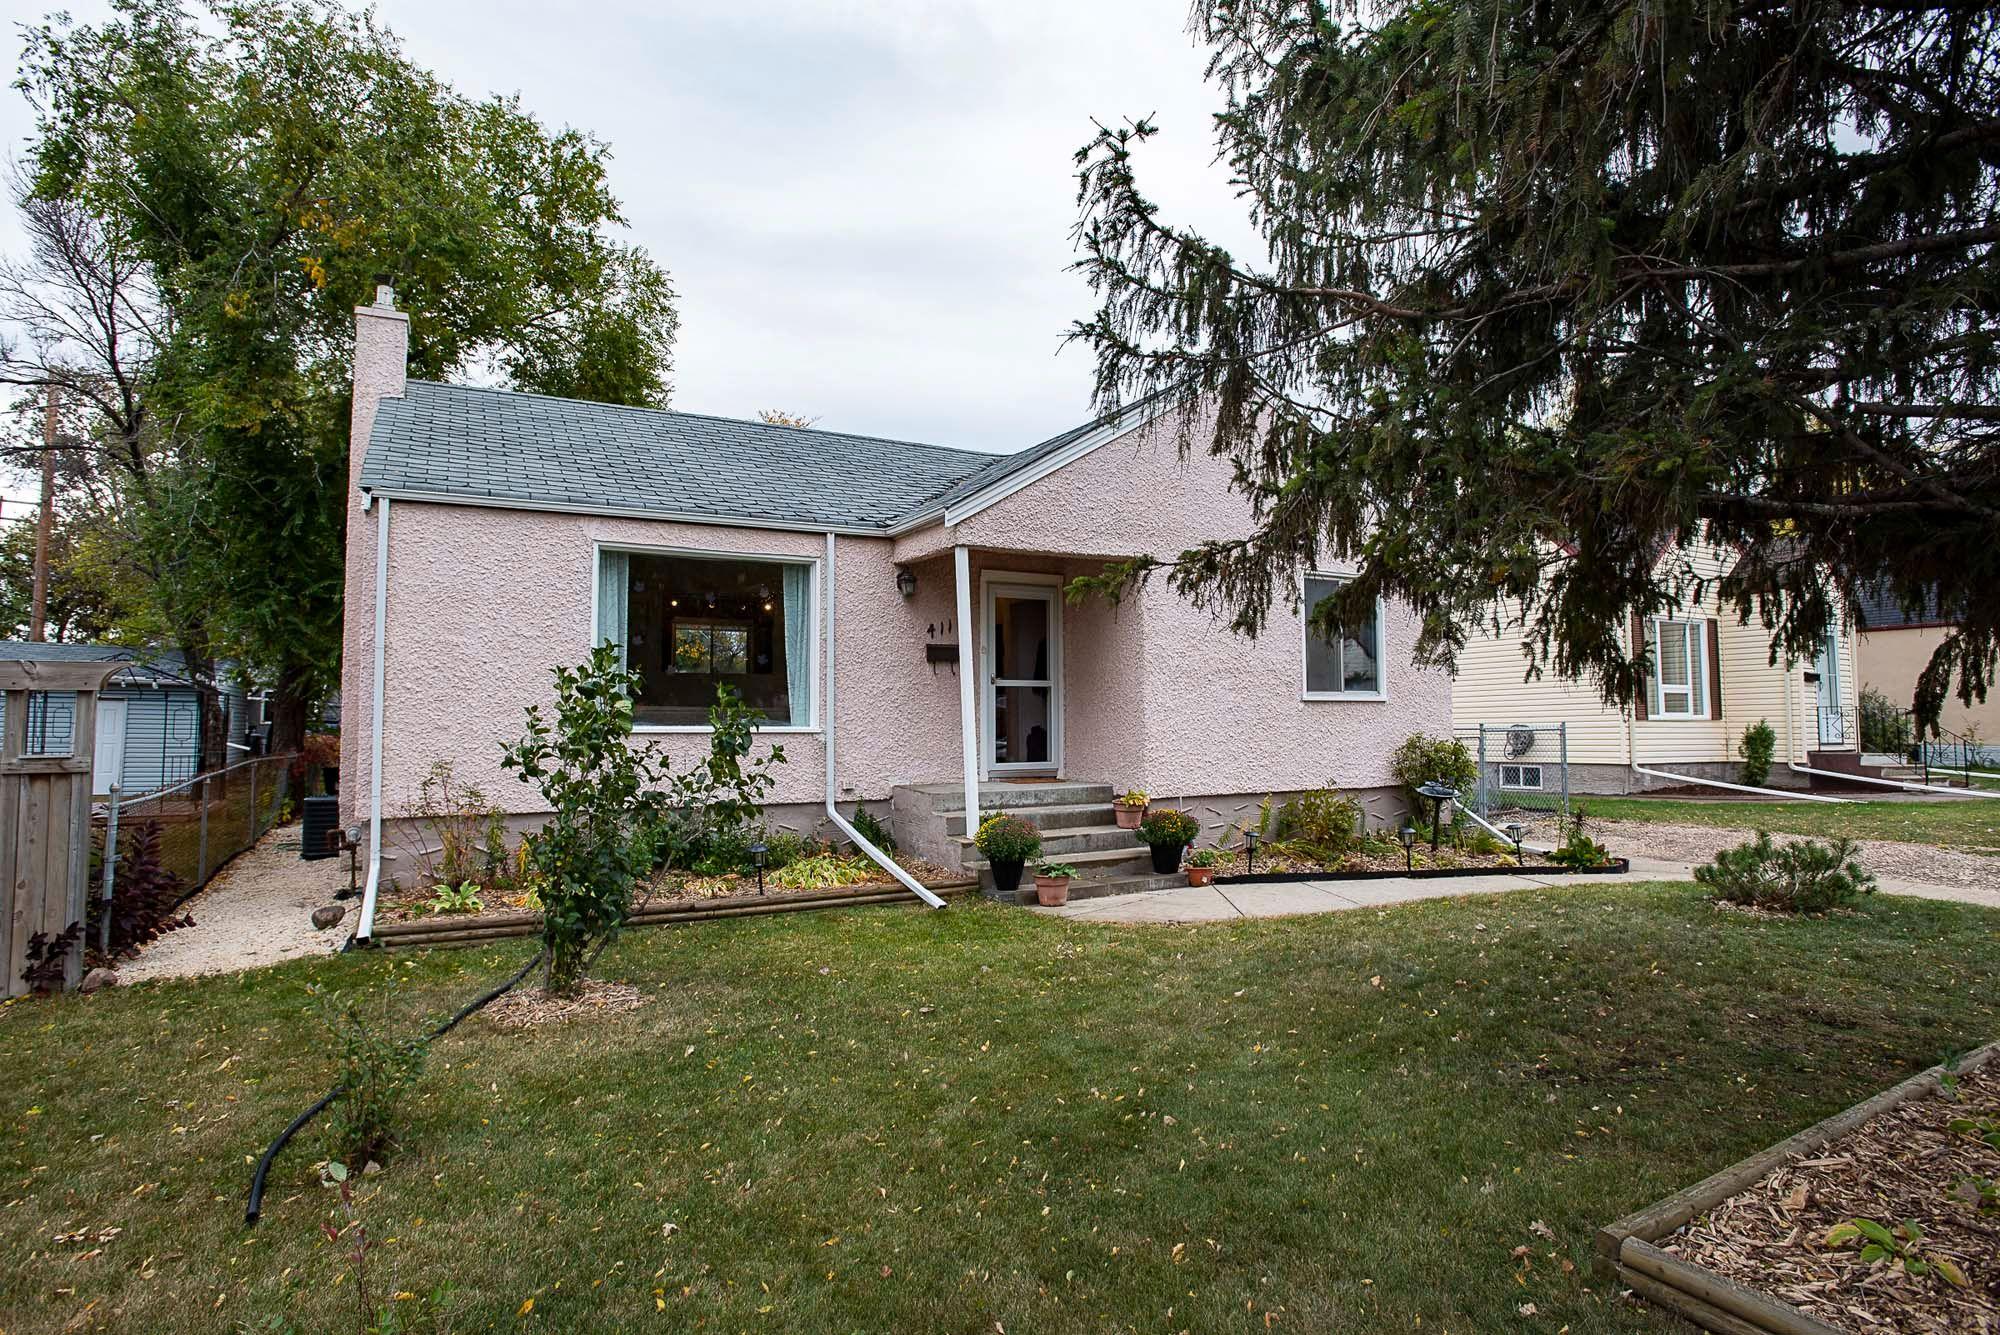 Main Photo: 411 Conway Street in Winnipeg: Deer Lodge Residential for sale (5E)  : MLS®# 202025312